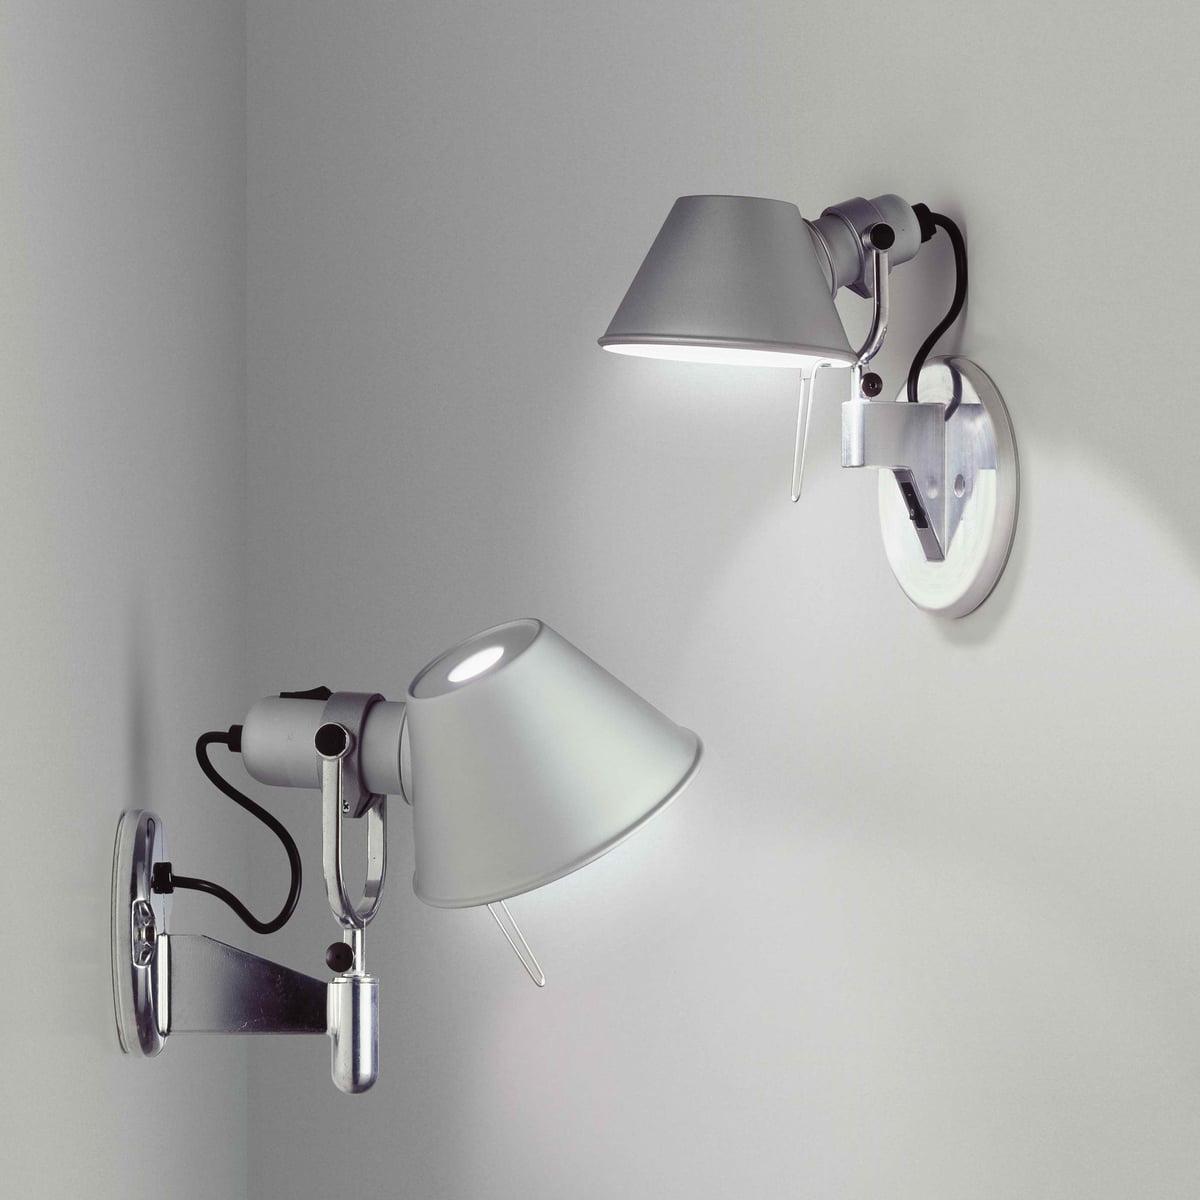 huge selection of f7bd3 ed6e4 Artemide - Tolomeo - Faretto wall lamp, aluminium silver